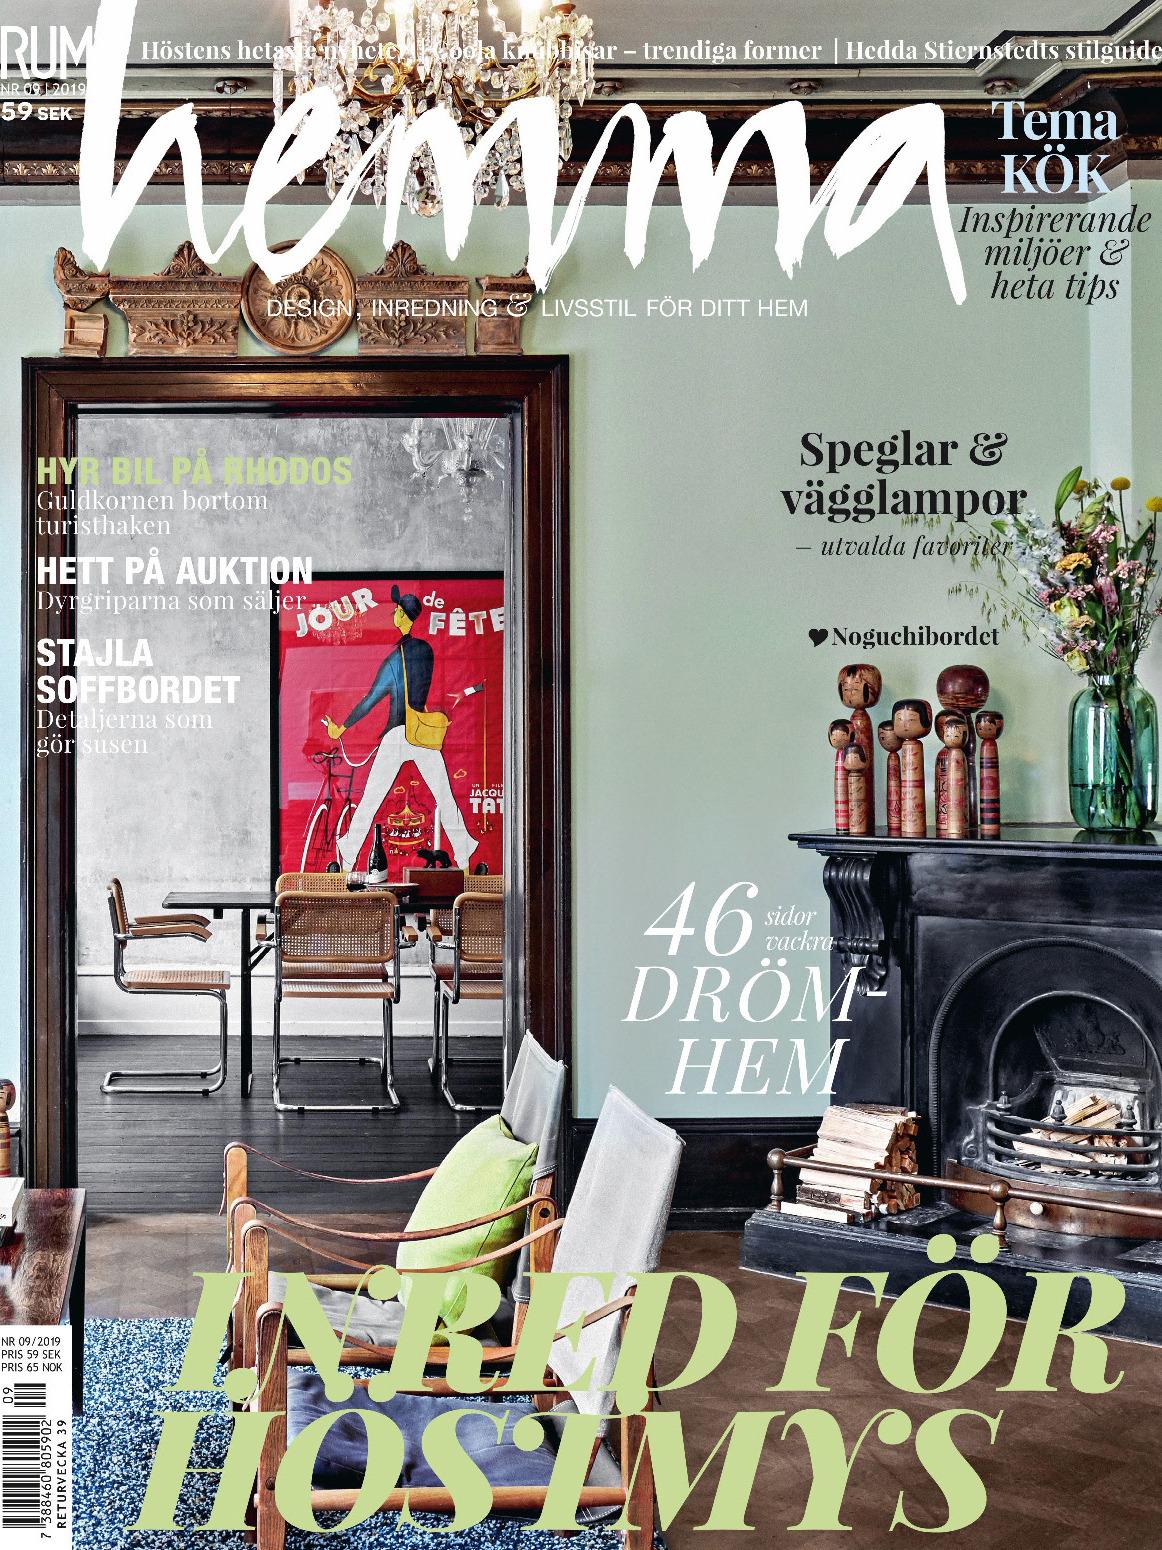 《Rum Hemma》瑞典版时尚家居杂志2019年09月号